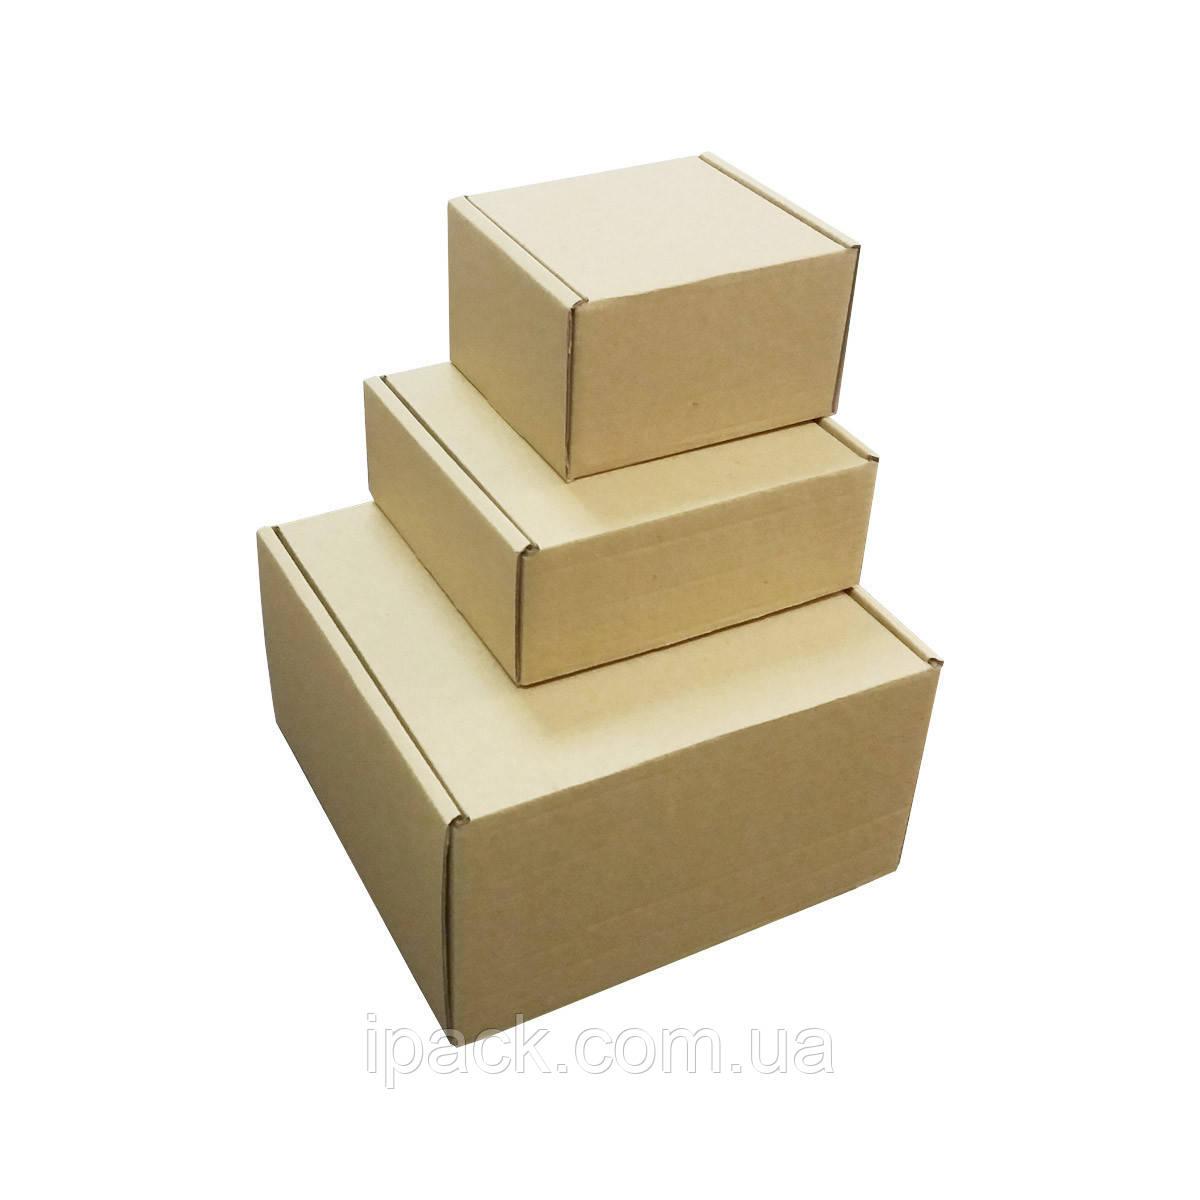 Коробка картонная самосборная, 195*140*240, мм, бурая, крафт, микрогофрокартон